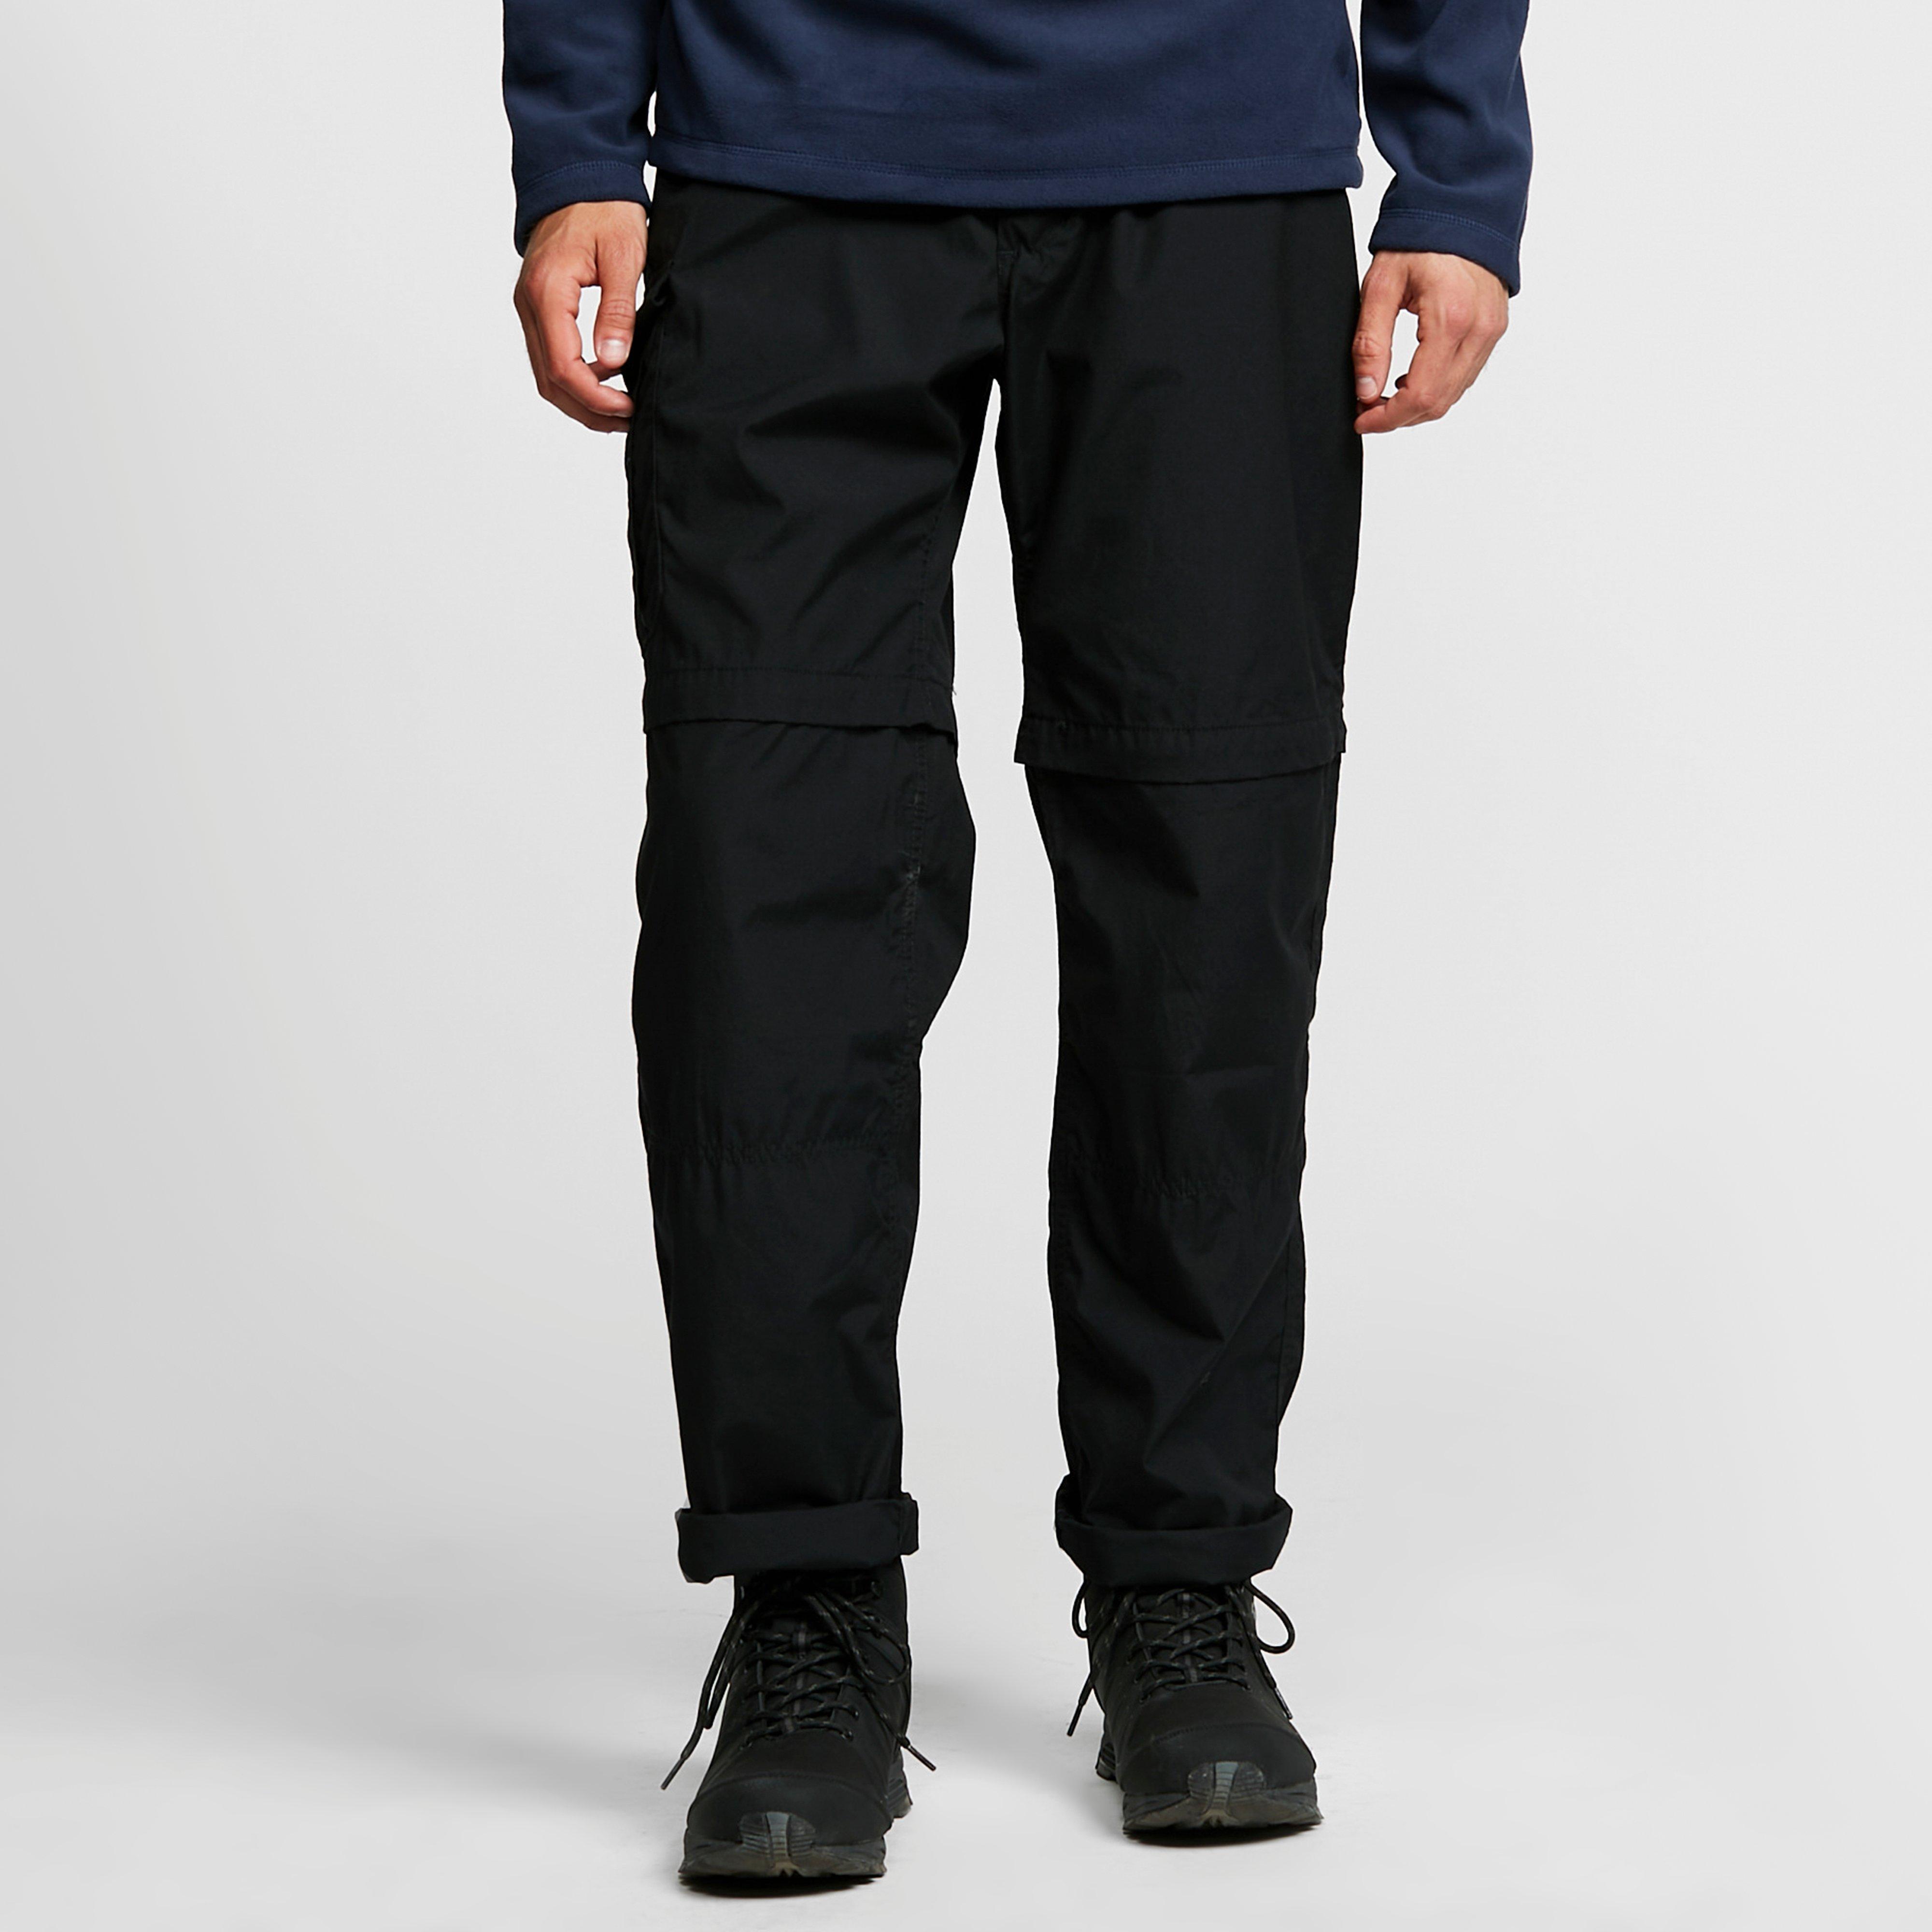 Craghoppers Mens Kiwi Convertible Trousers - Black/blk  Black/blk